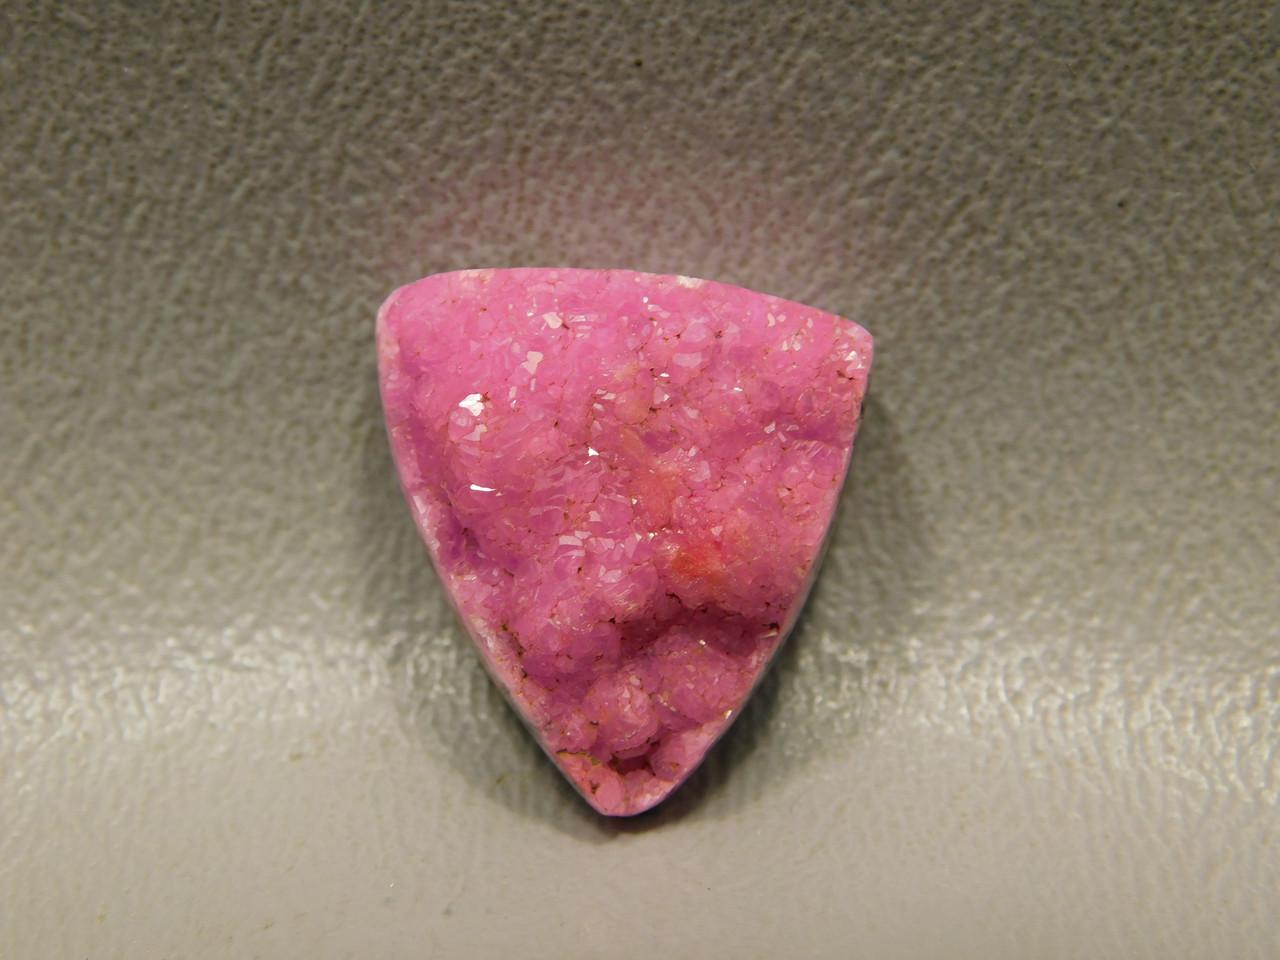 Cobalto Calcite Pink Drusy Crystal Natural Gemstone Cabochon #13